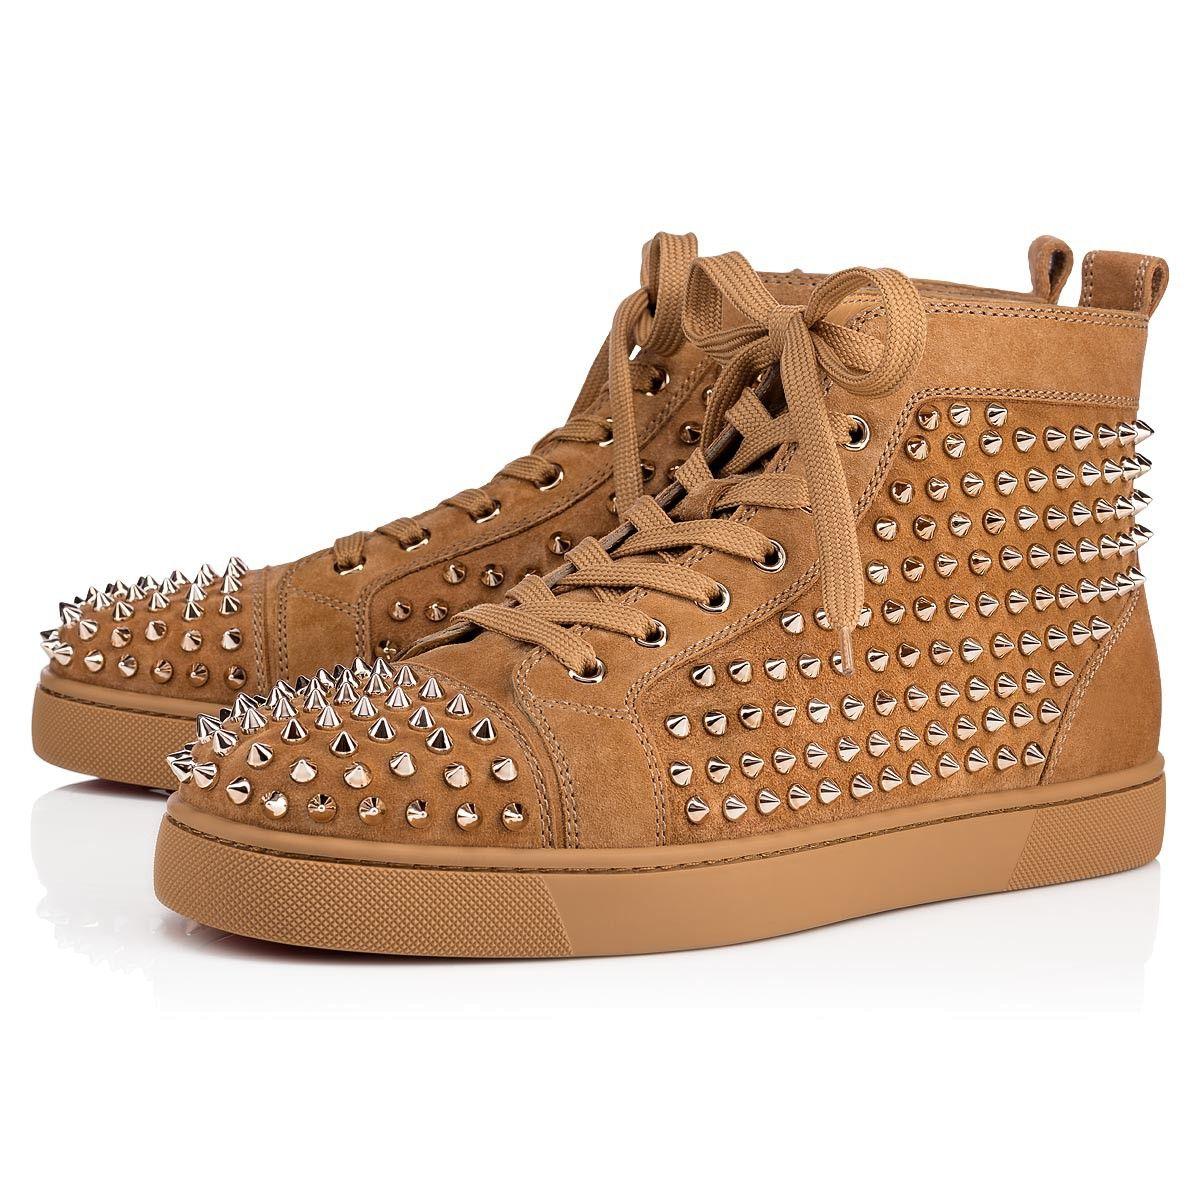 19efb3549c CHRISTIAN LOUBOUTIN Louis Veau Velours spikes.  christianlouboutin  shoes